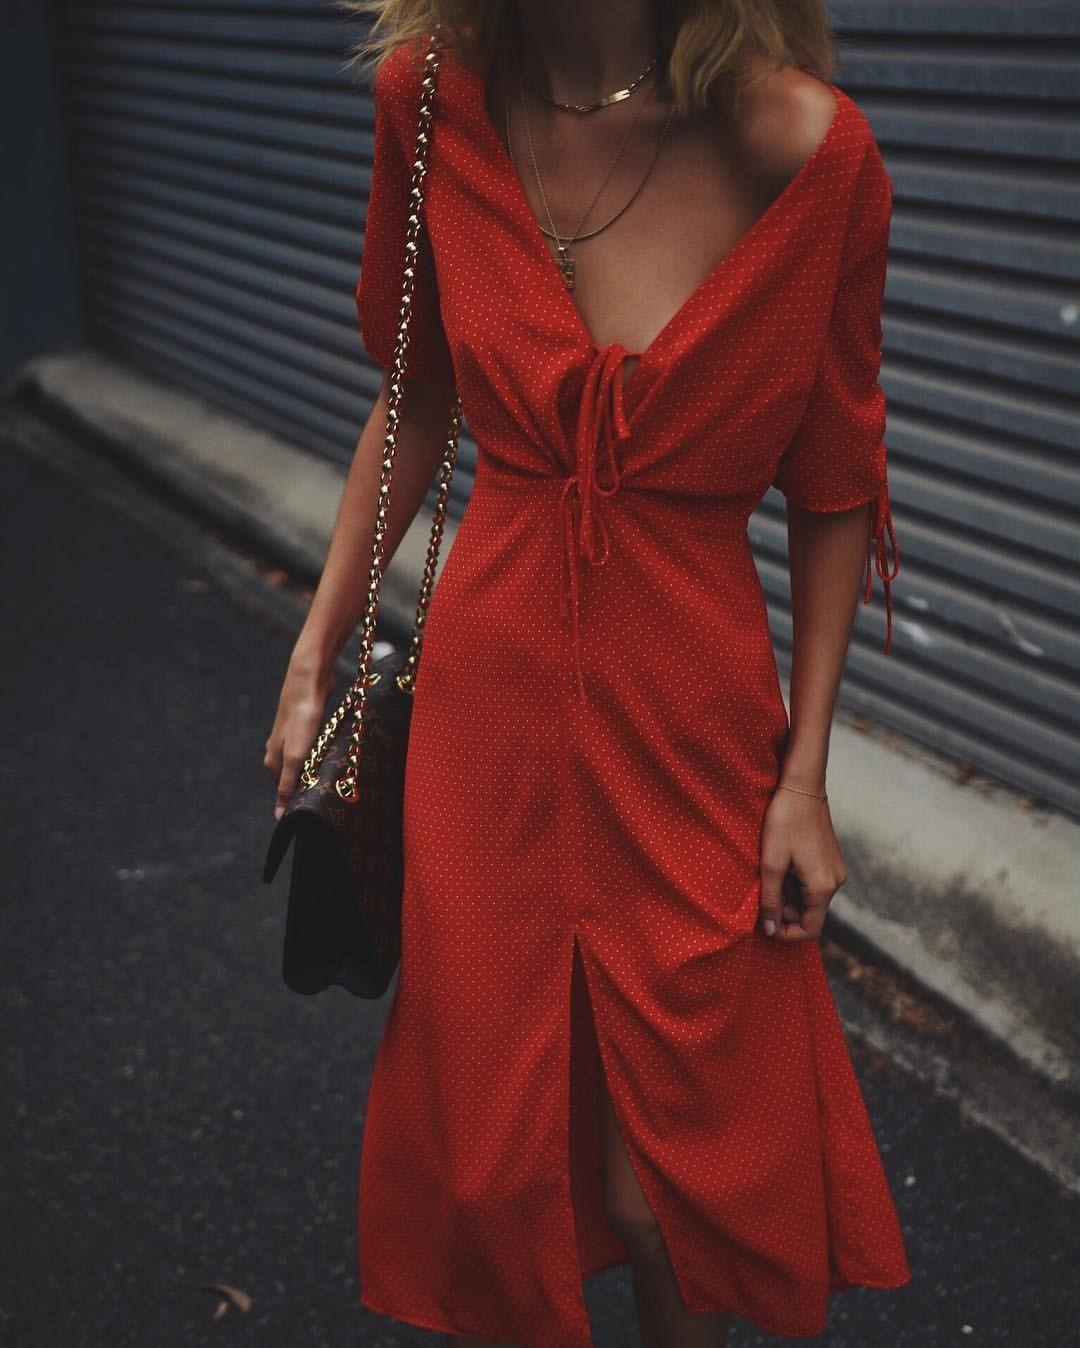 "JESSICA ALIZZI on Instagram: ""polka dots & red , seriously feeling @topshop_au new season dresses #topshopau"""